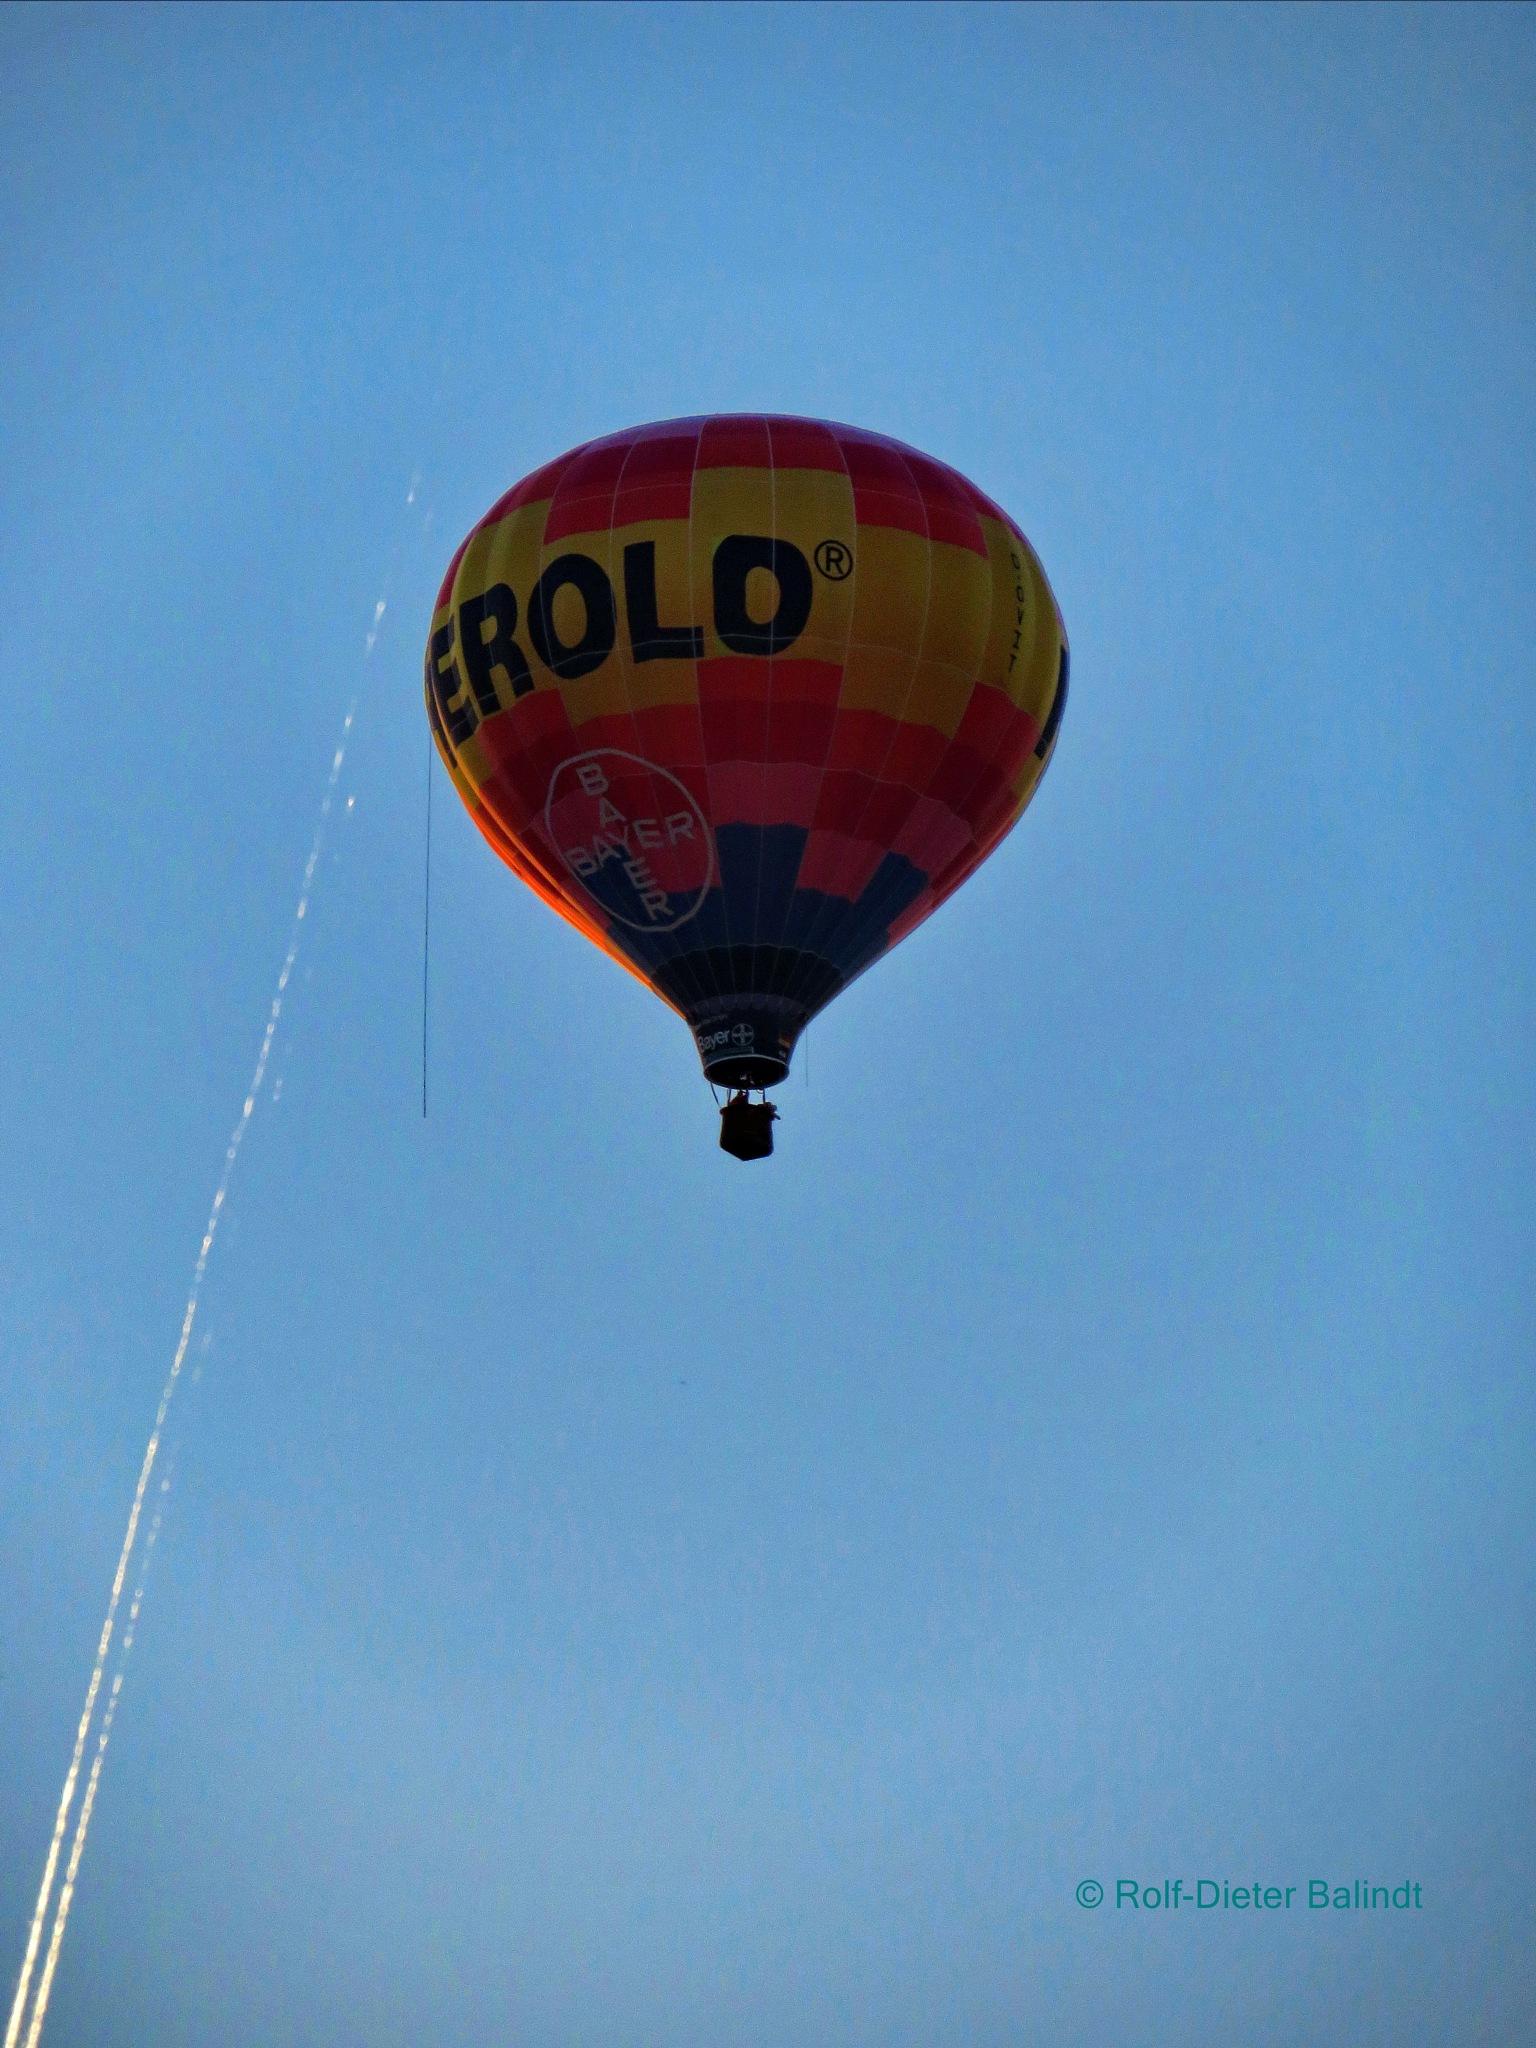 Heißluftballon by Rolf-Dieter Balindt